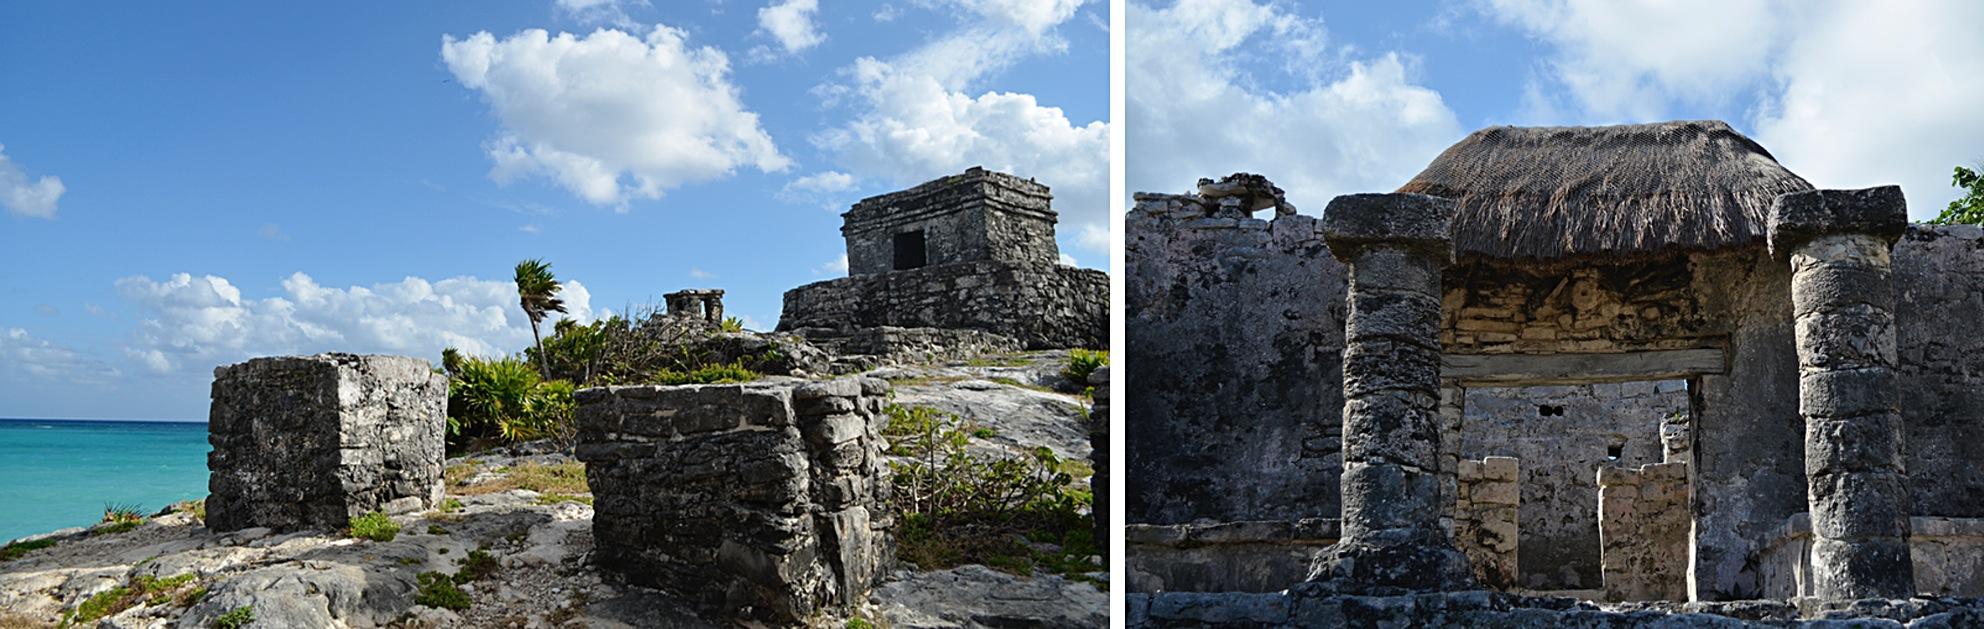 Mayan_Ruins_Tulum_13